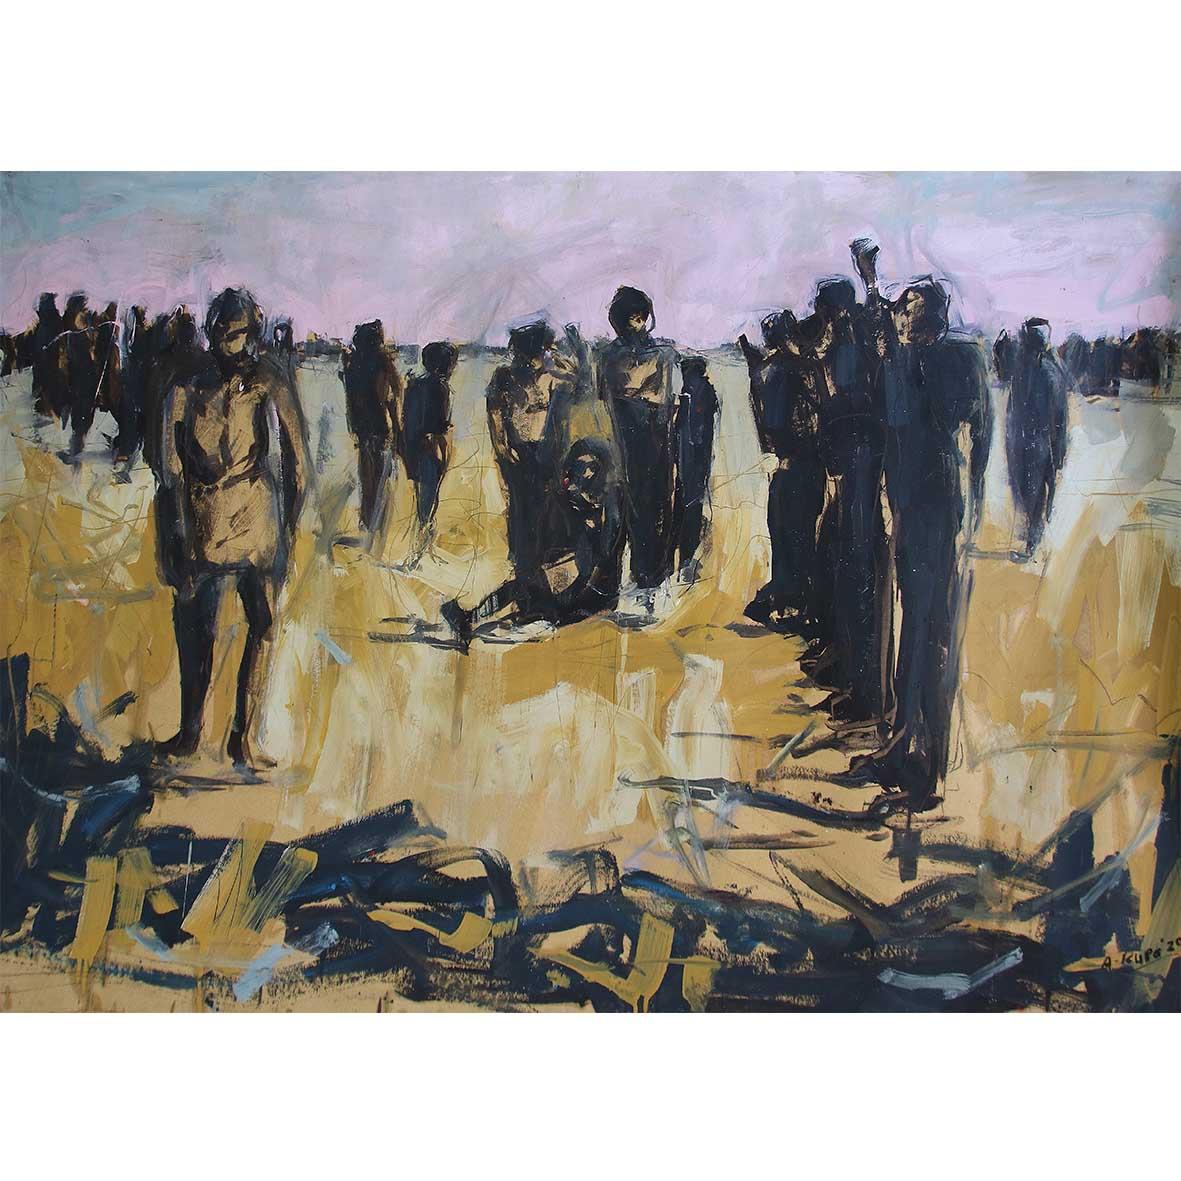 Asanda Kupa Umonakalo ezweni 2020 Oil on paper 90 x 140 cm